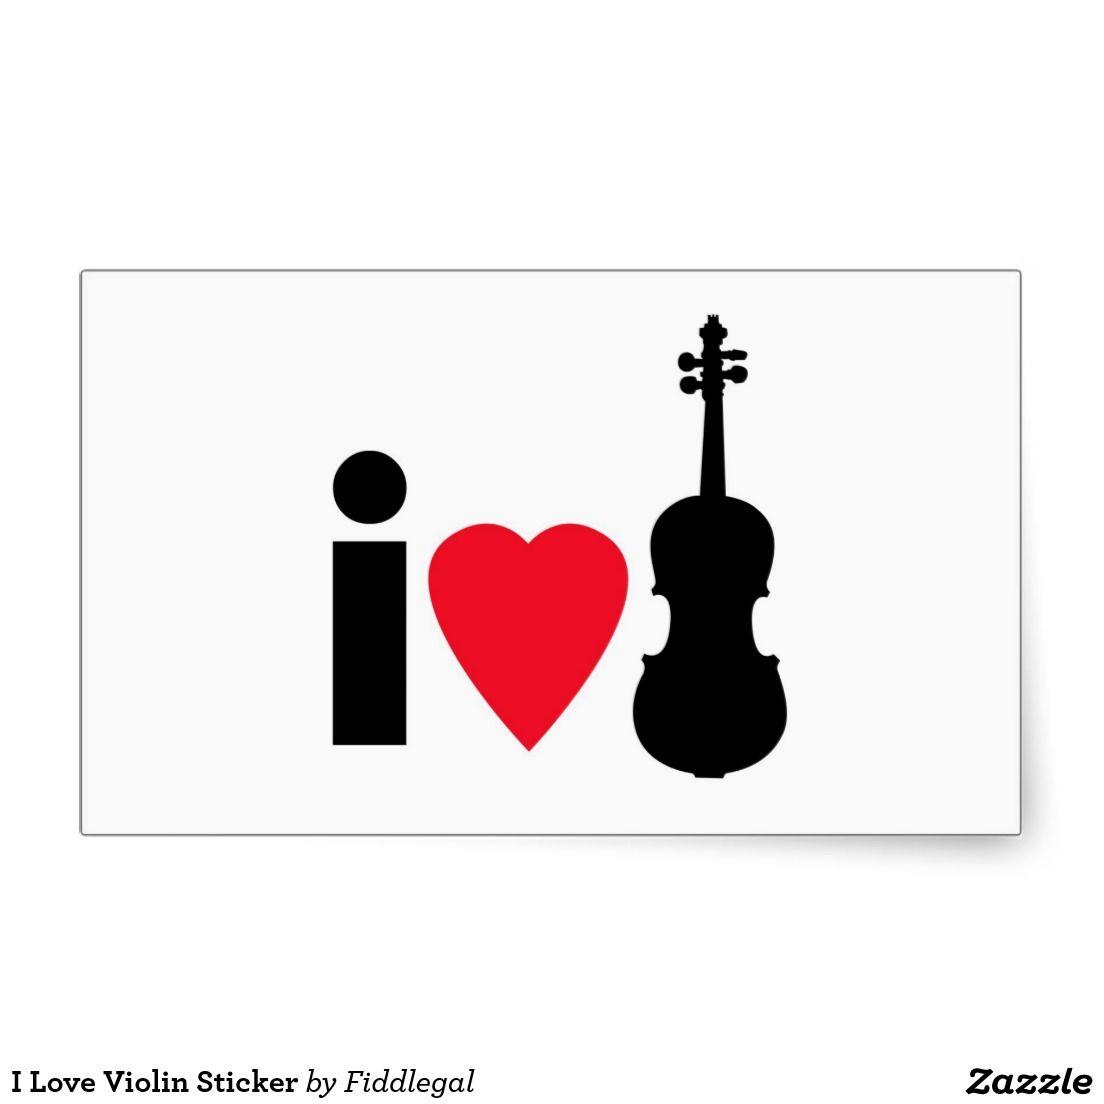 I Love Violin Sticker